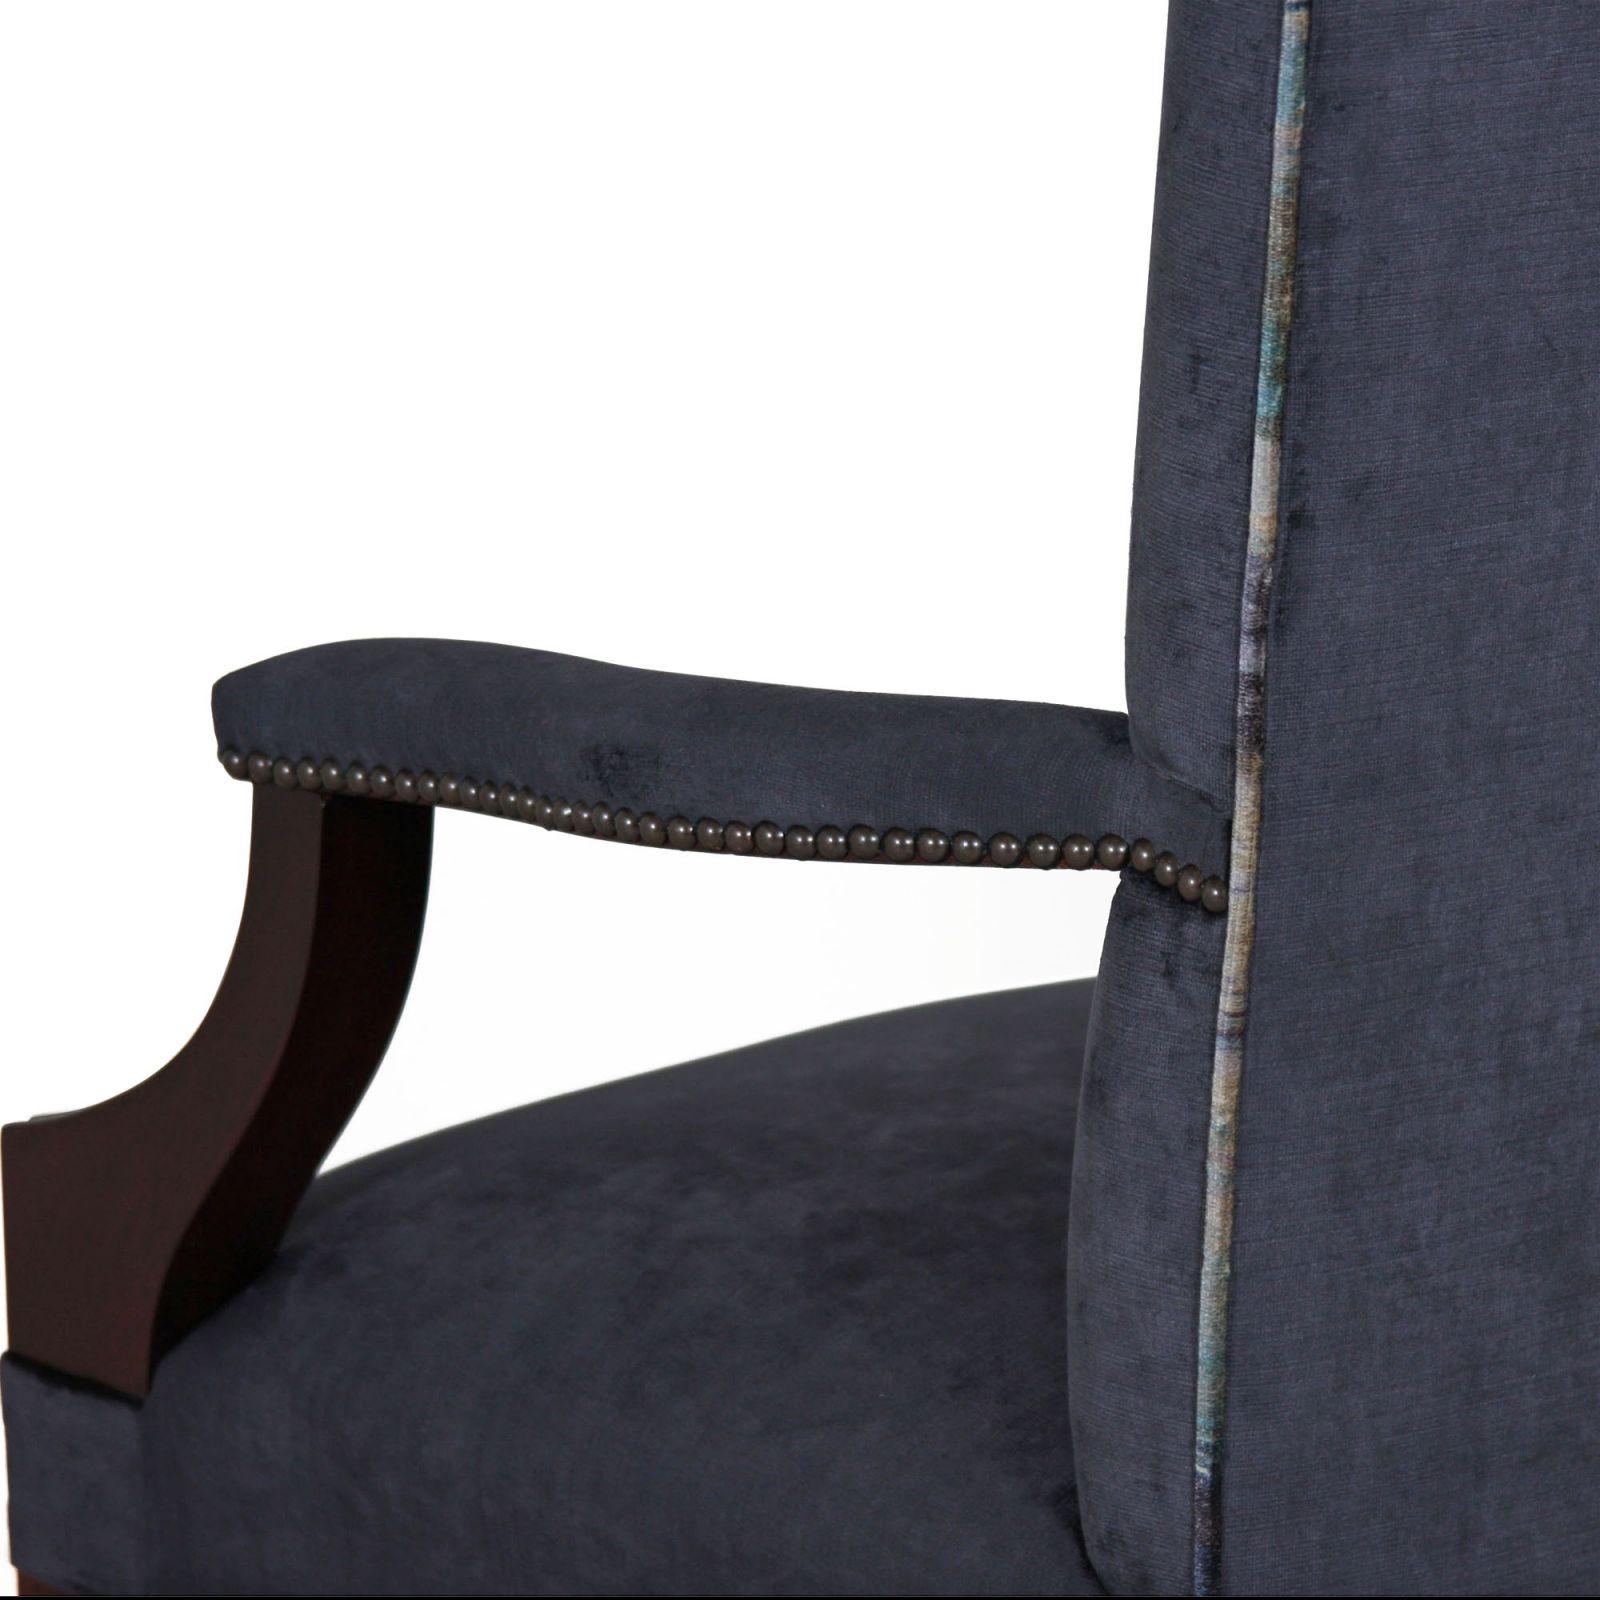 Mahogany upholstered back dining carver in Wemyss Kentia